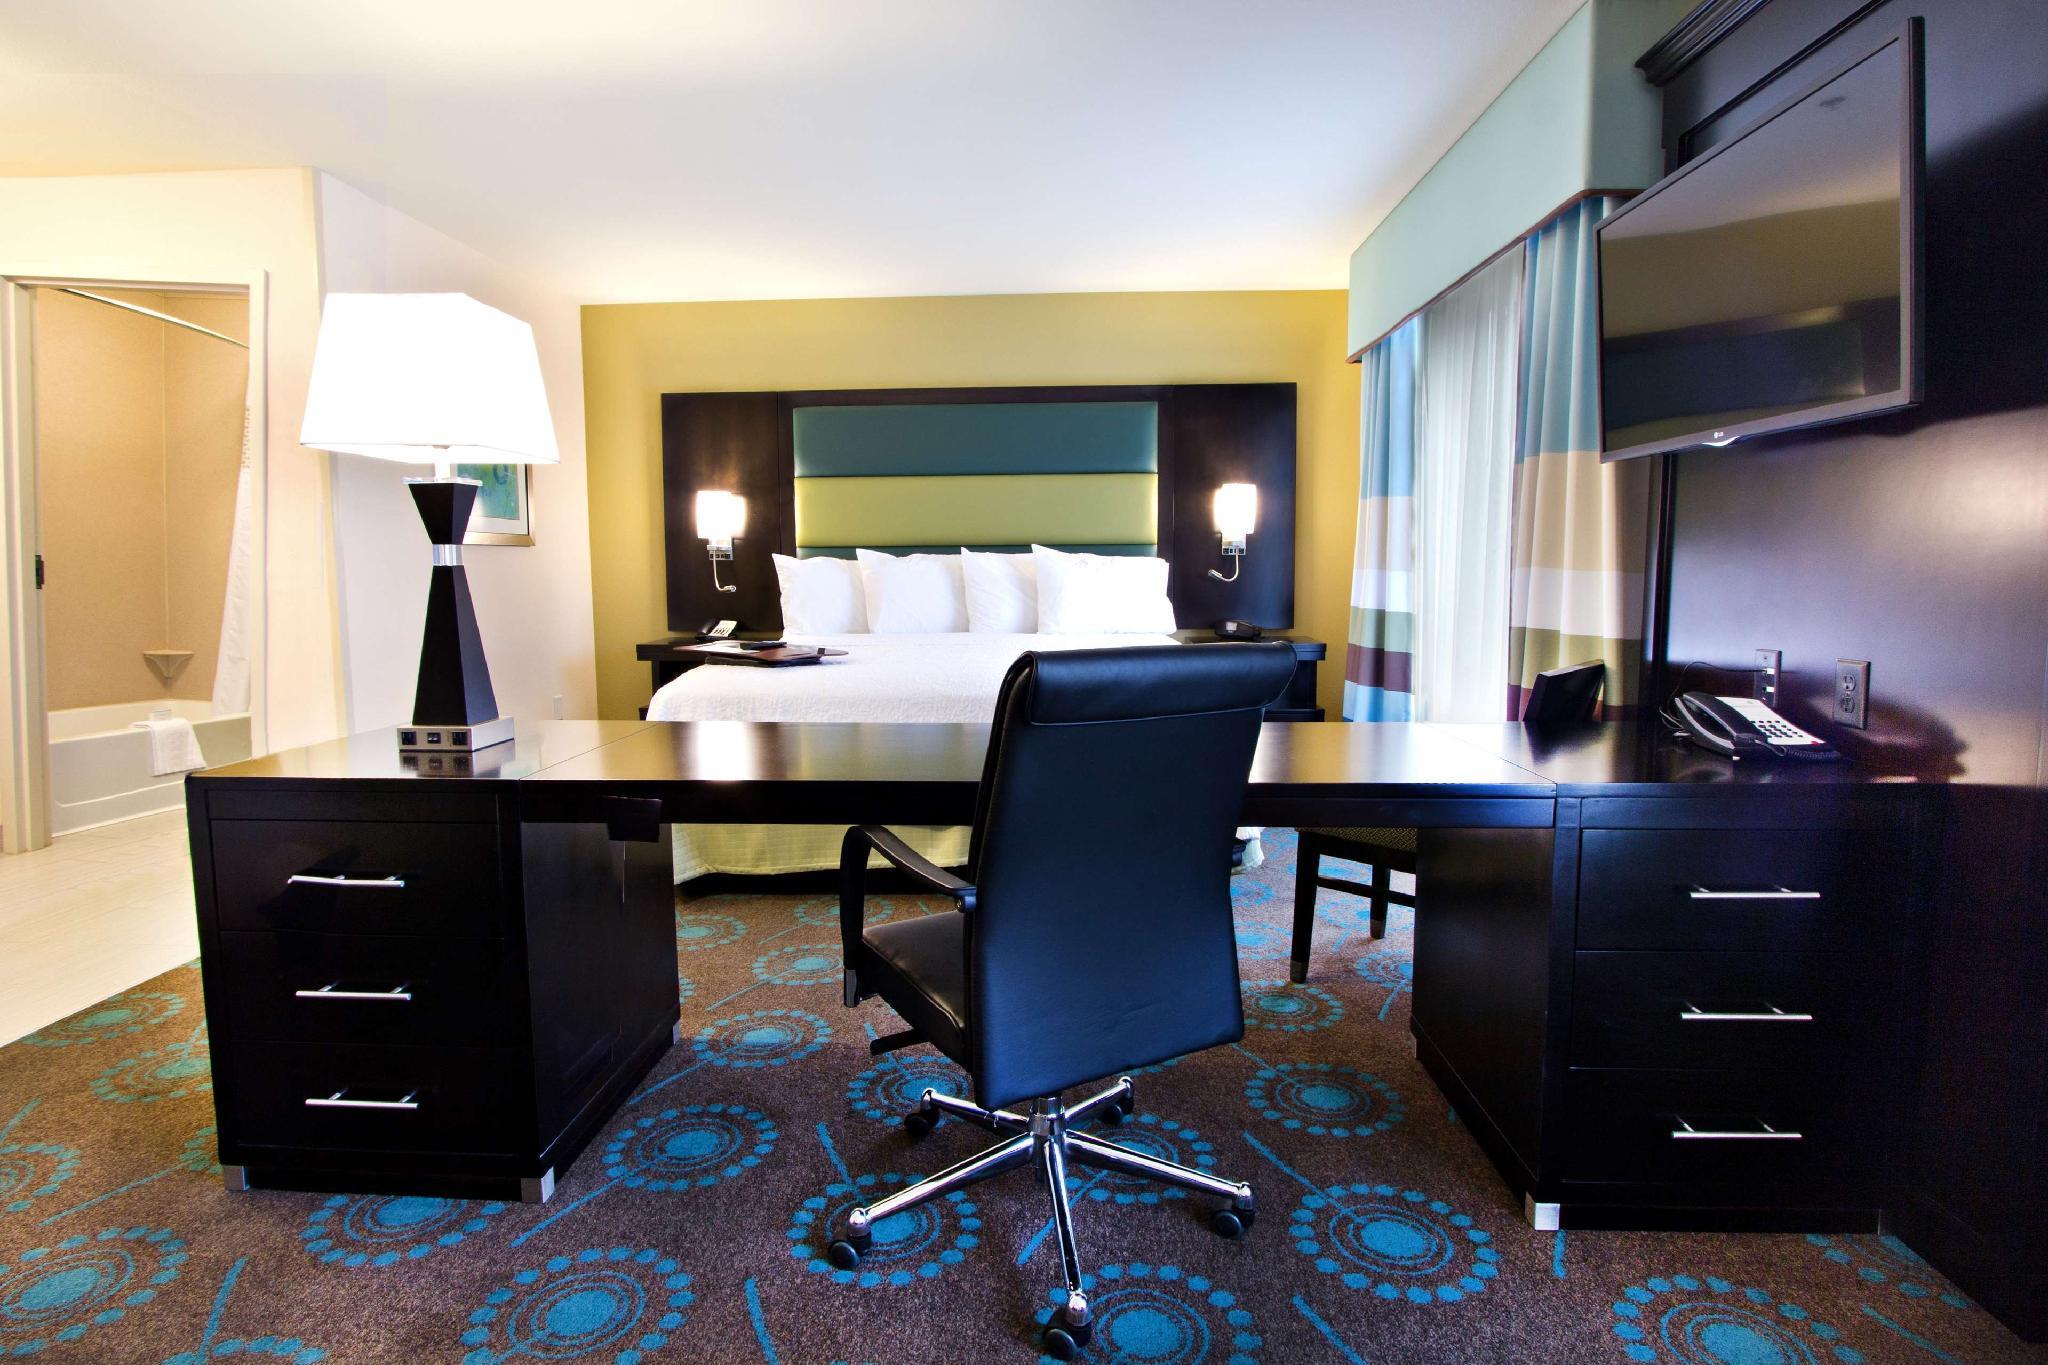 Hampton Inn & Suites Salt Lake City/Farmington, Davis